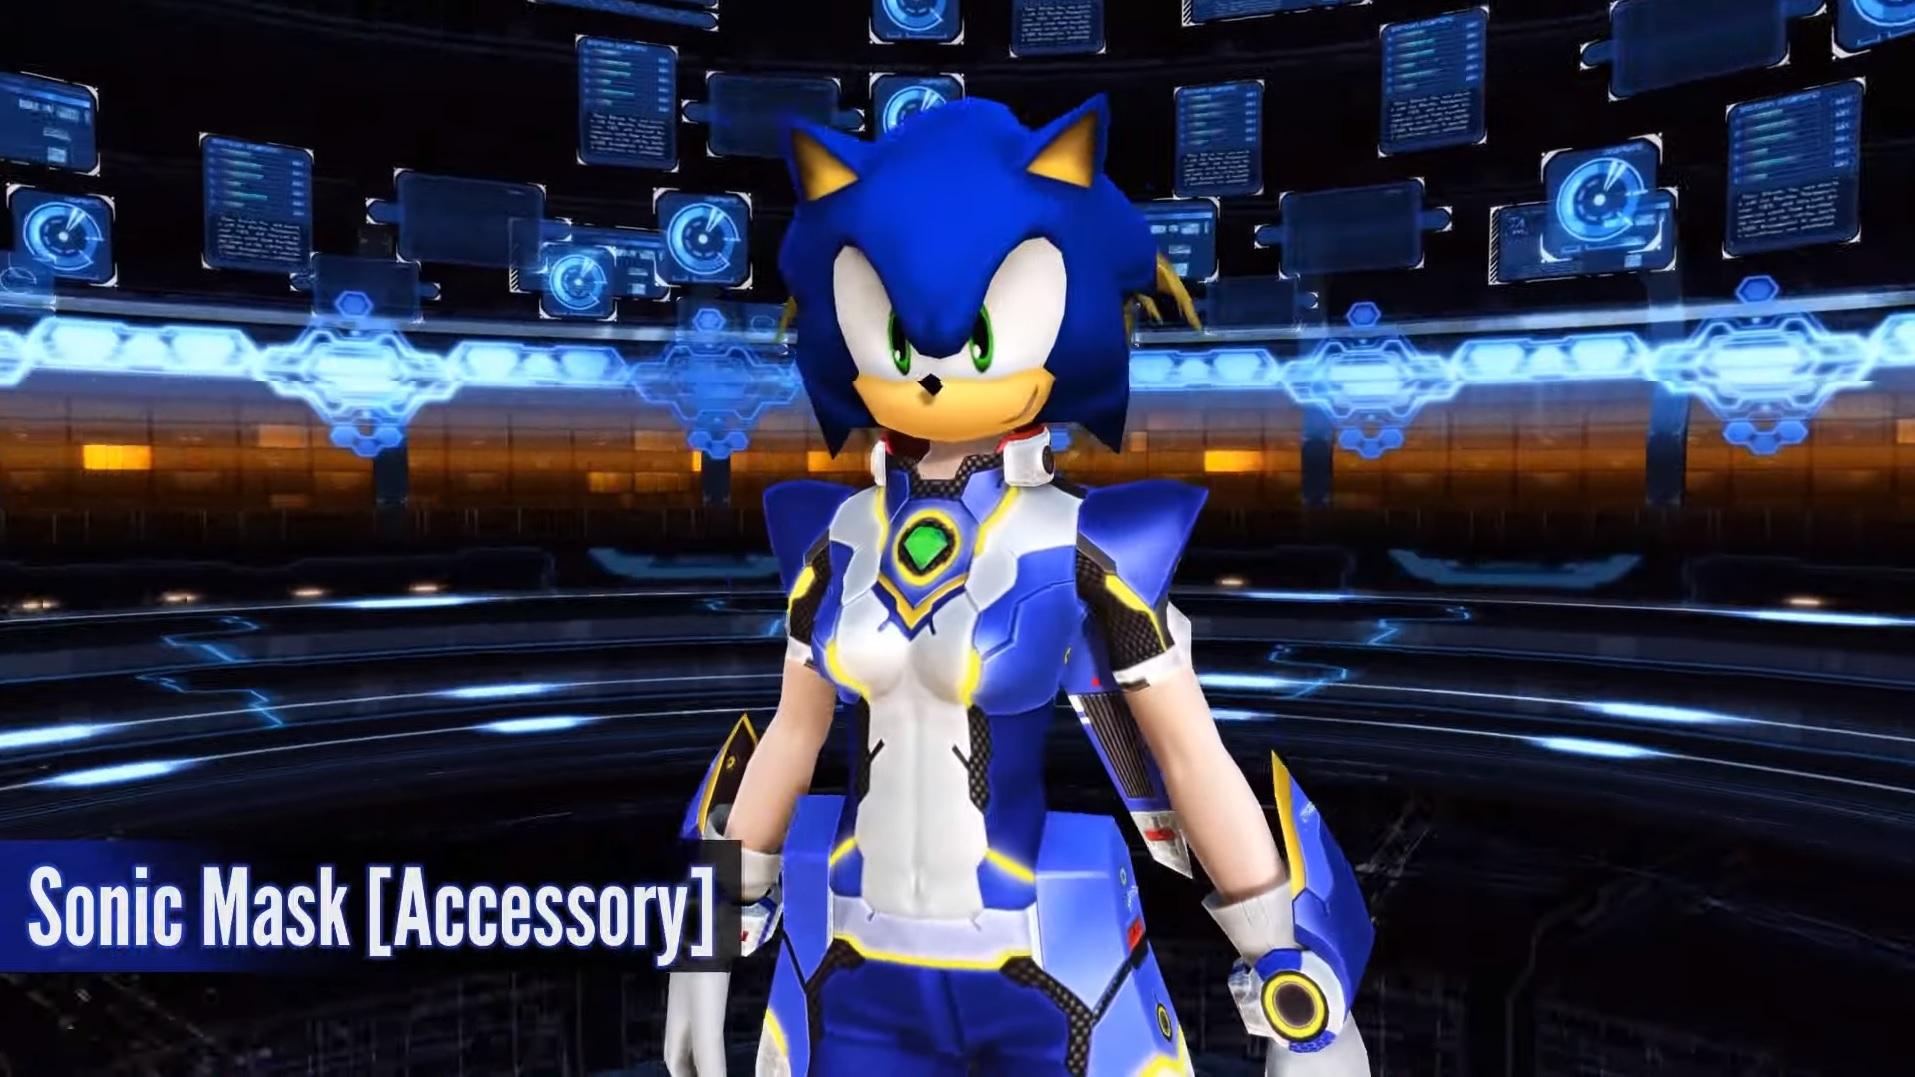 Phantasy Star Online 2's $60 founder's pack dresses you up like Sonic screenshot